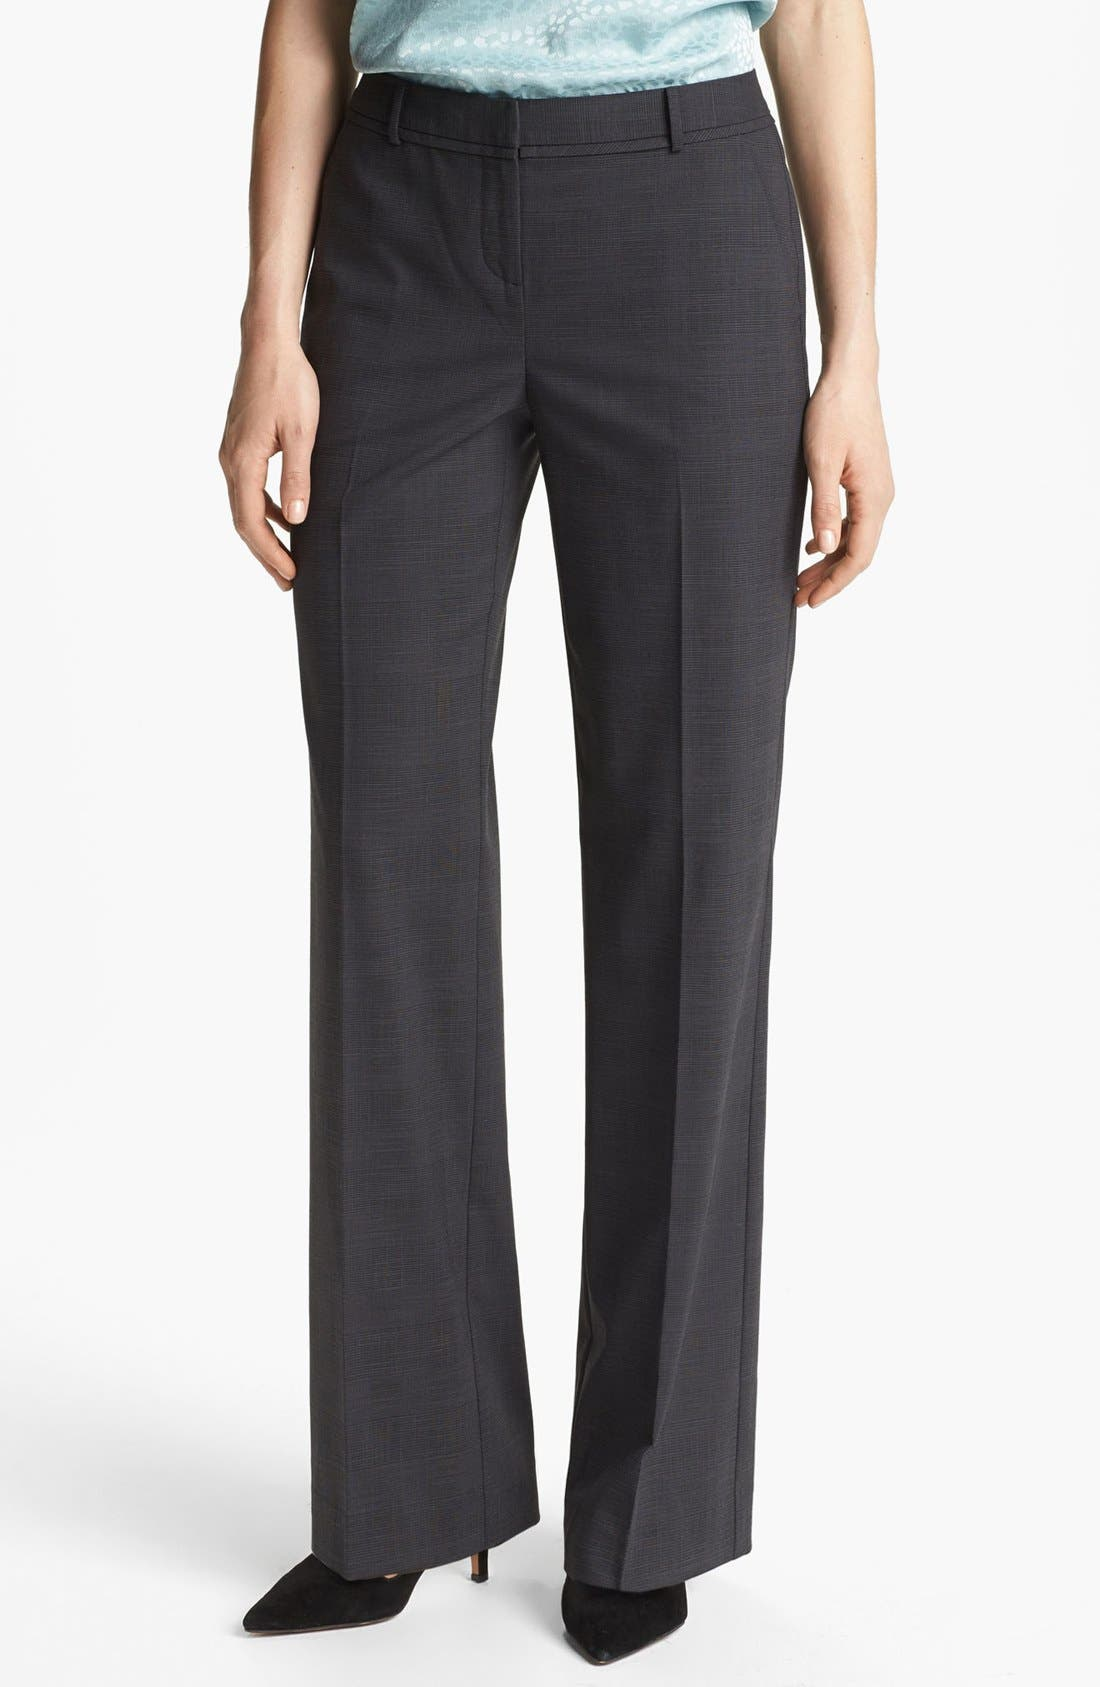 Alternate Image 1 Selected - Halogen® 'Taylor' Etched Plaid Pants